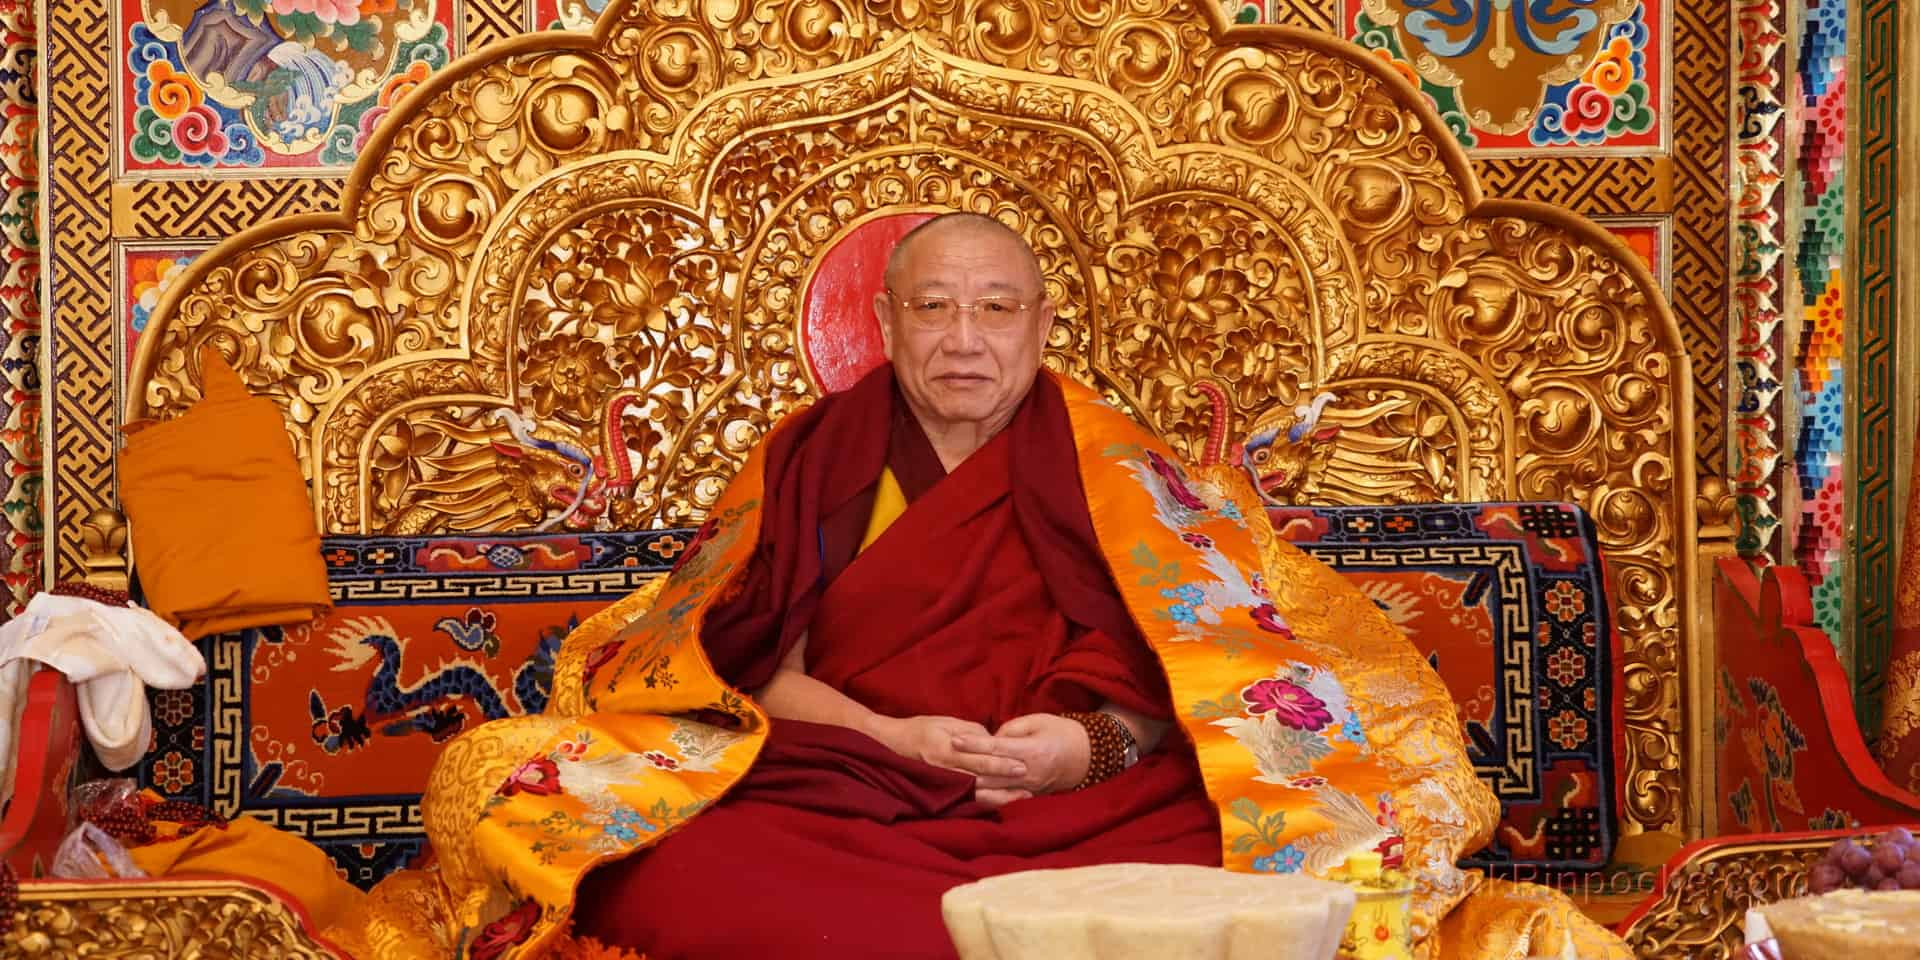 Gosok Rinpoche DSC00108 1920